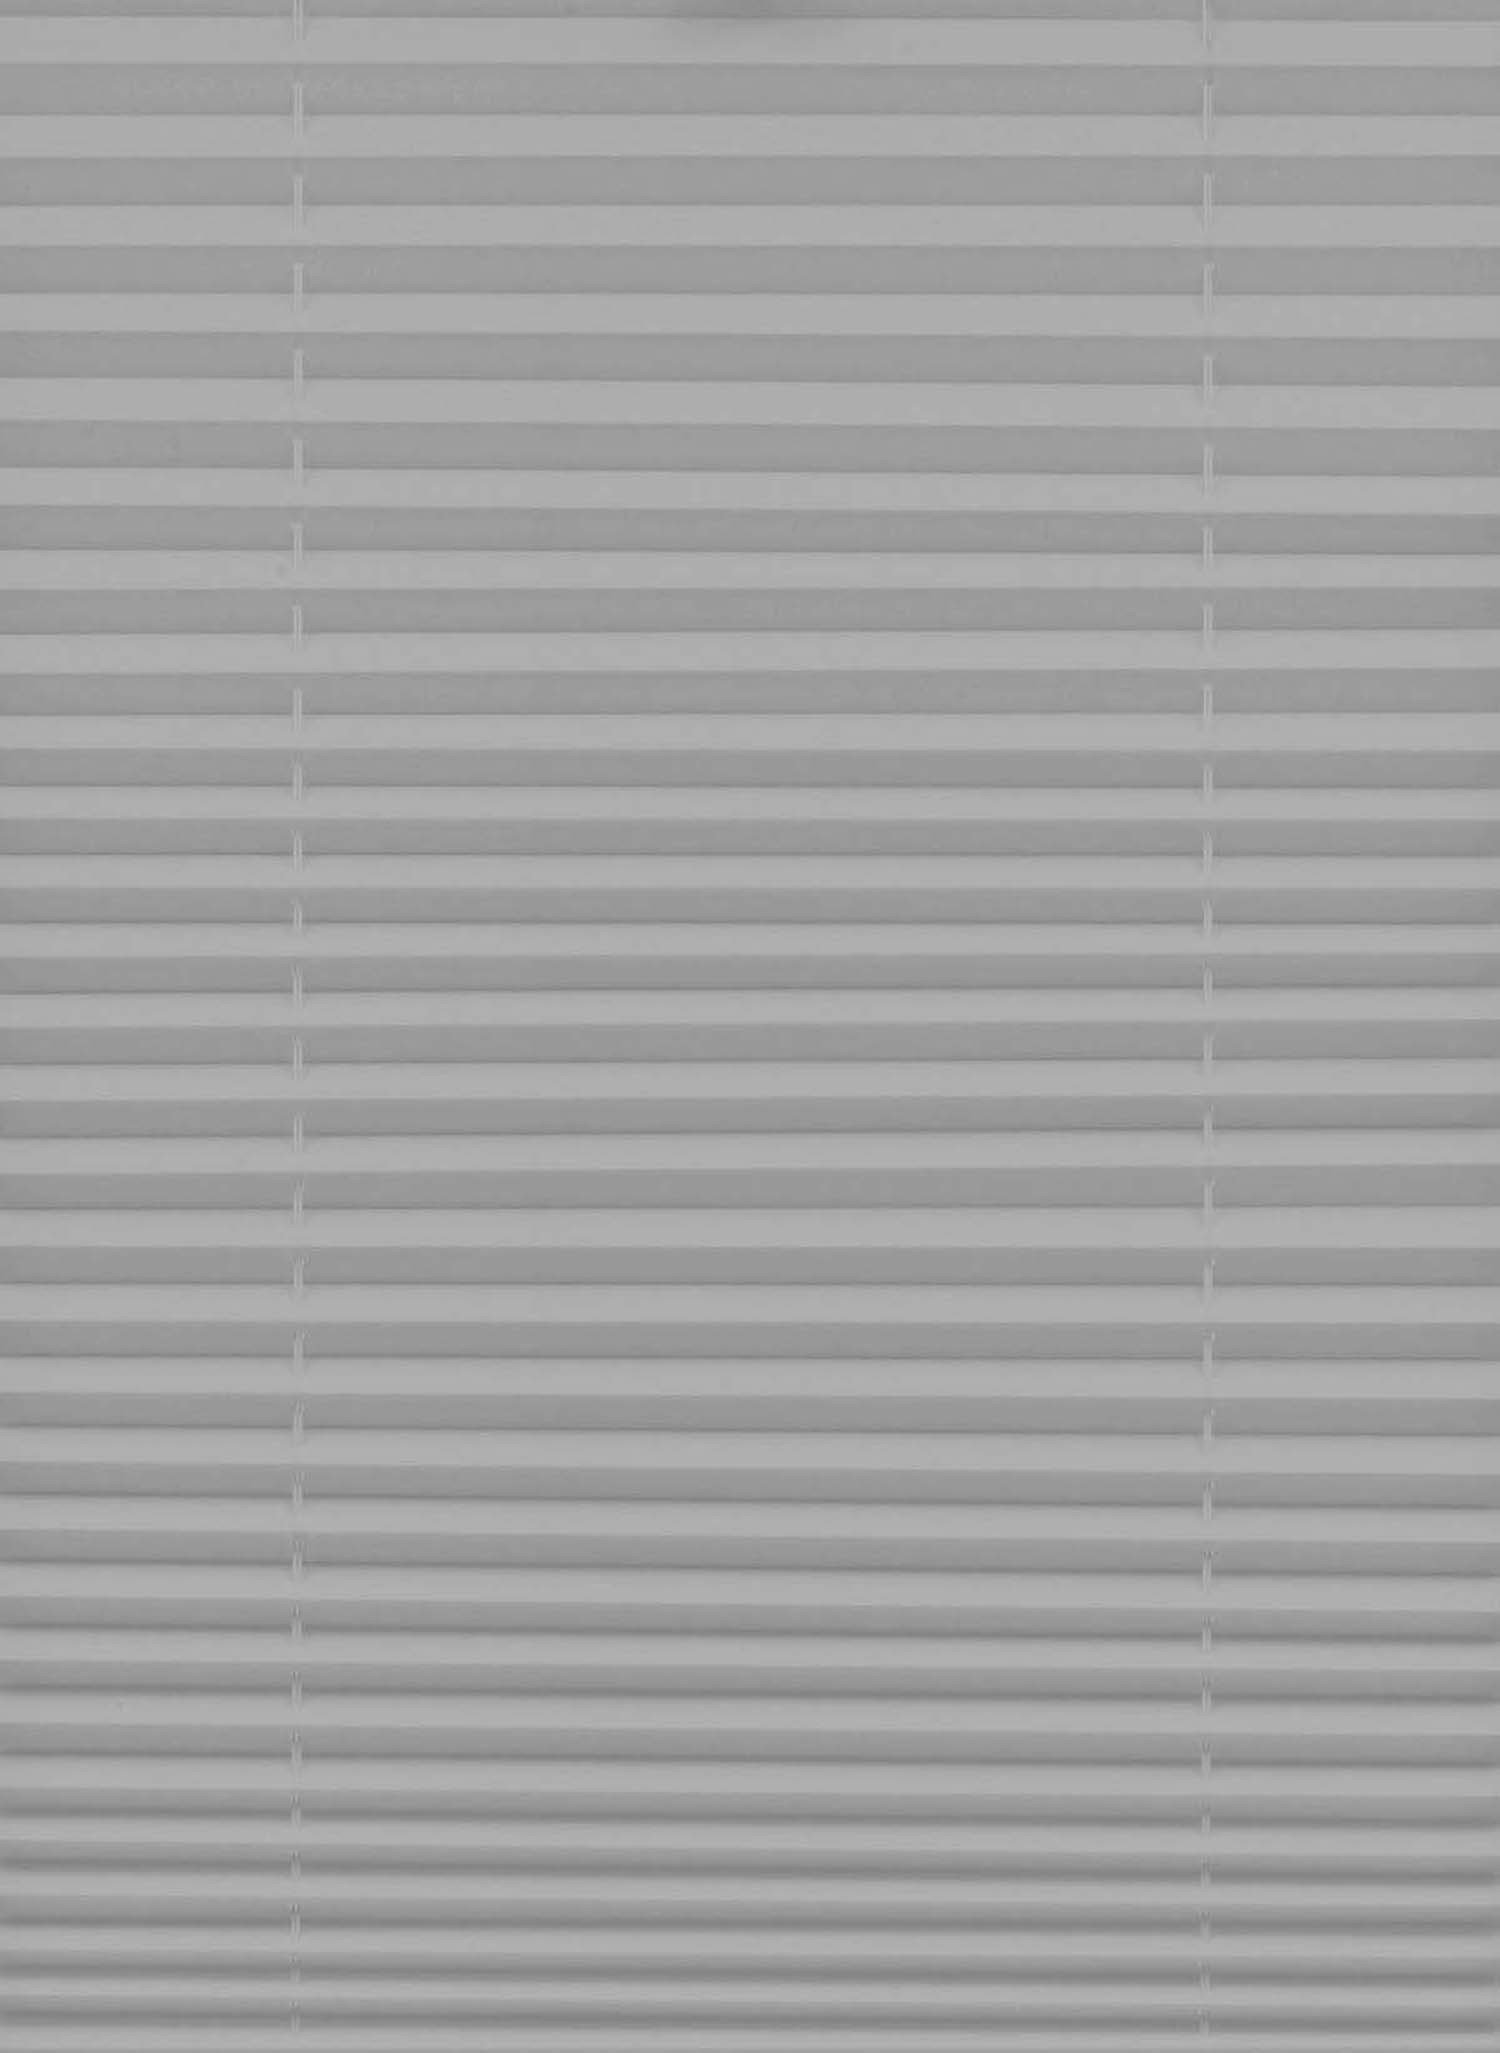 Easyfix Plissee weiss 40x130cm - 5 - Ronja.ch